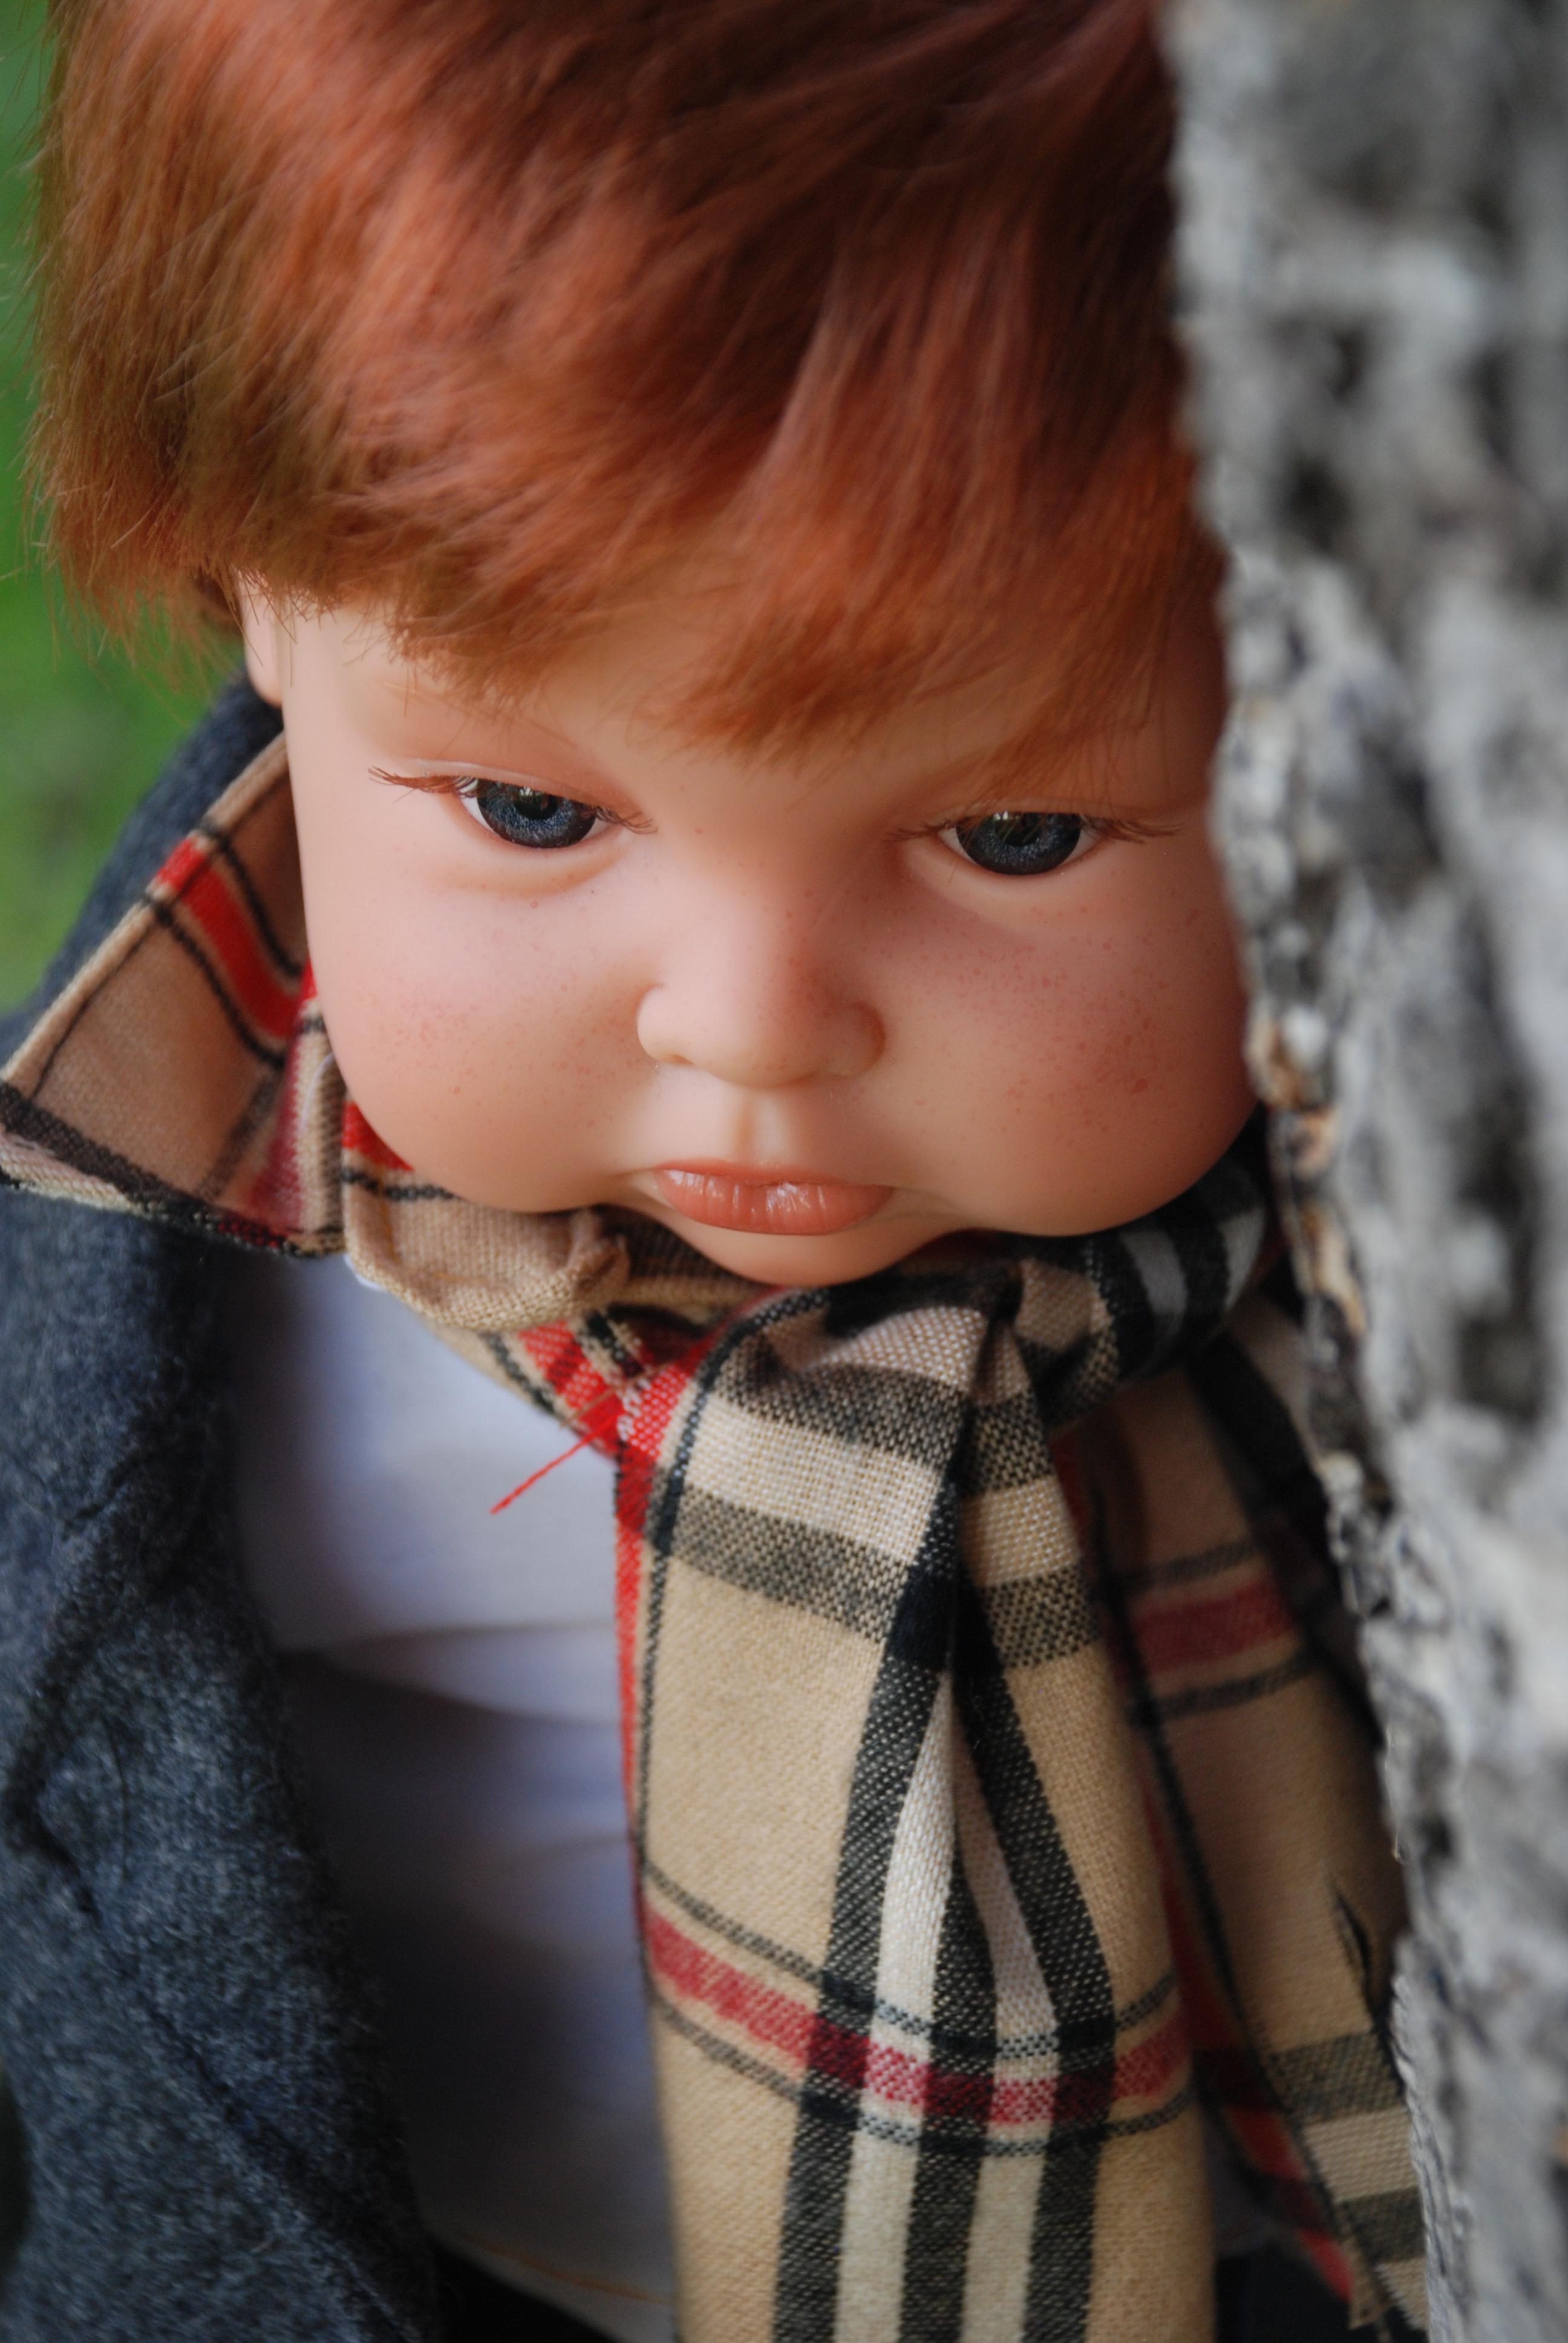 Realistická panenka chlapeček Berry od firmy Endisa ze Španělska (Doprava zdarma)